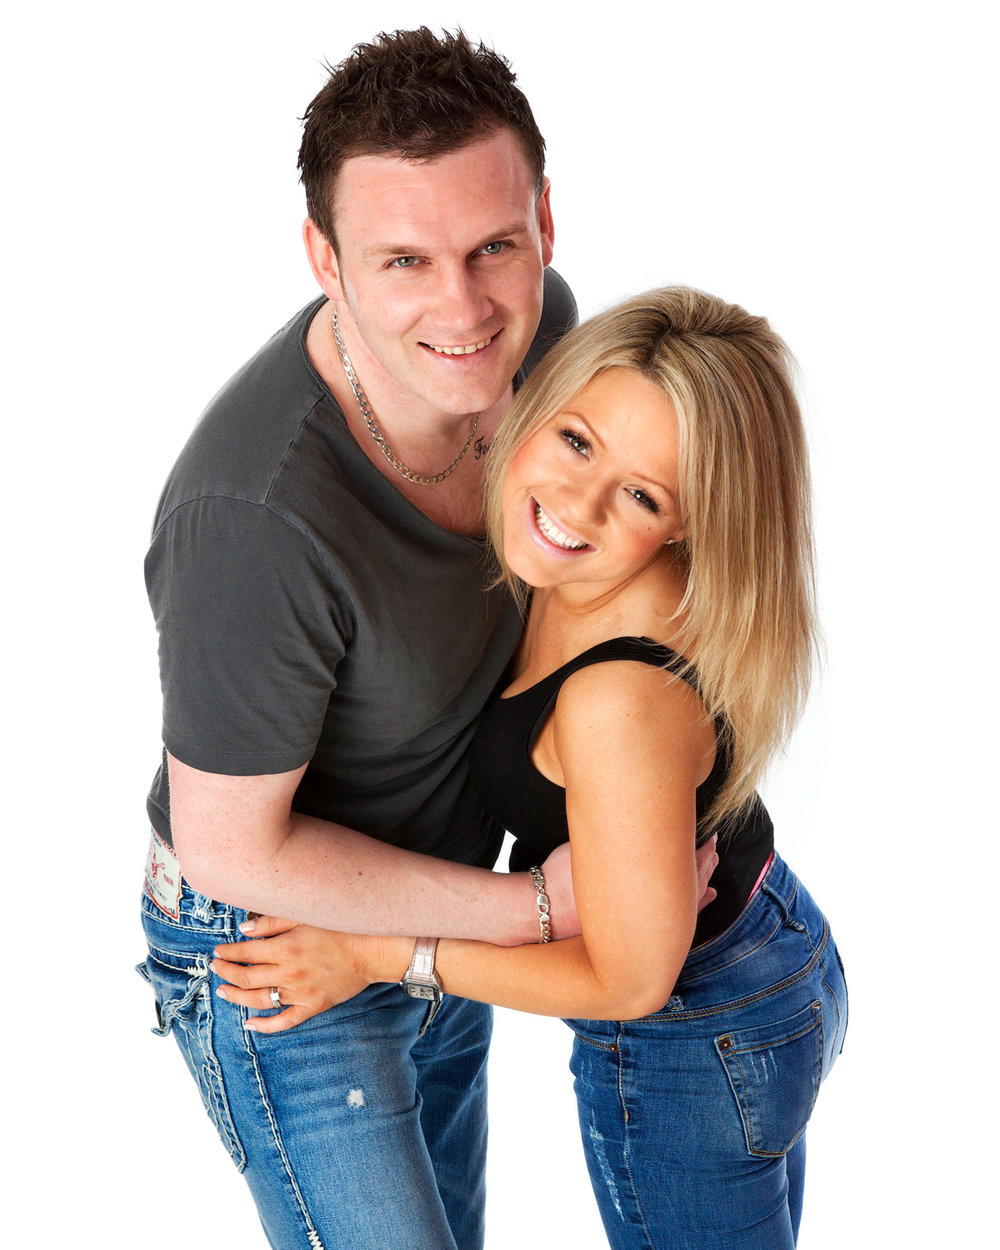 Couple_Adult_Portrait_Photographer_Newbury_Berkshire_056.jpg